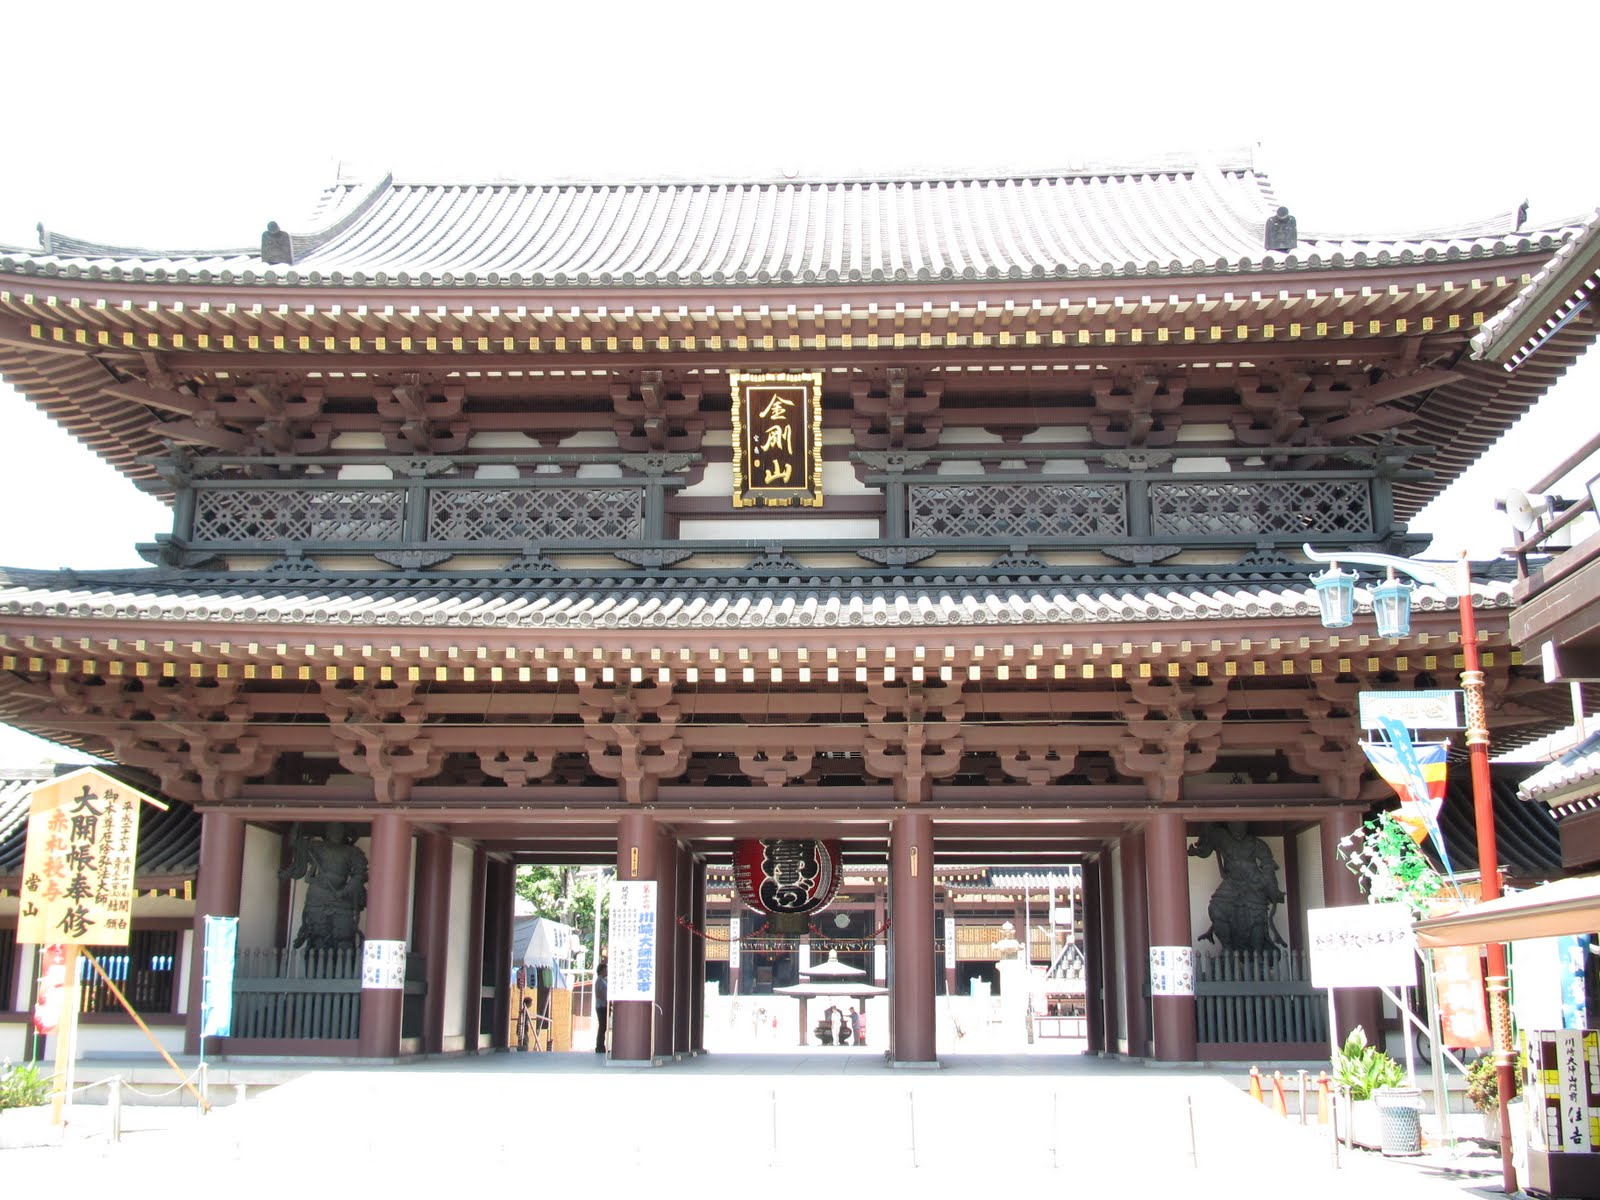 Francois Illas New Tradition: Explore Japan From Kanagawa: Kawasaki Daishi By Jib